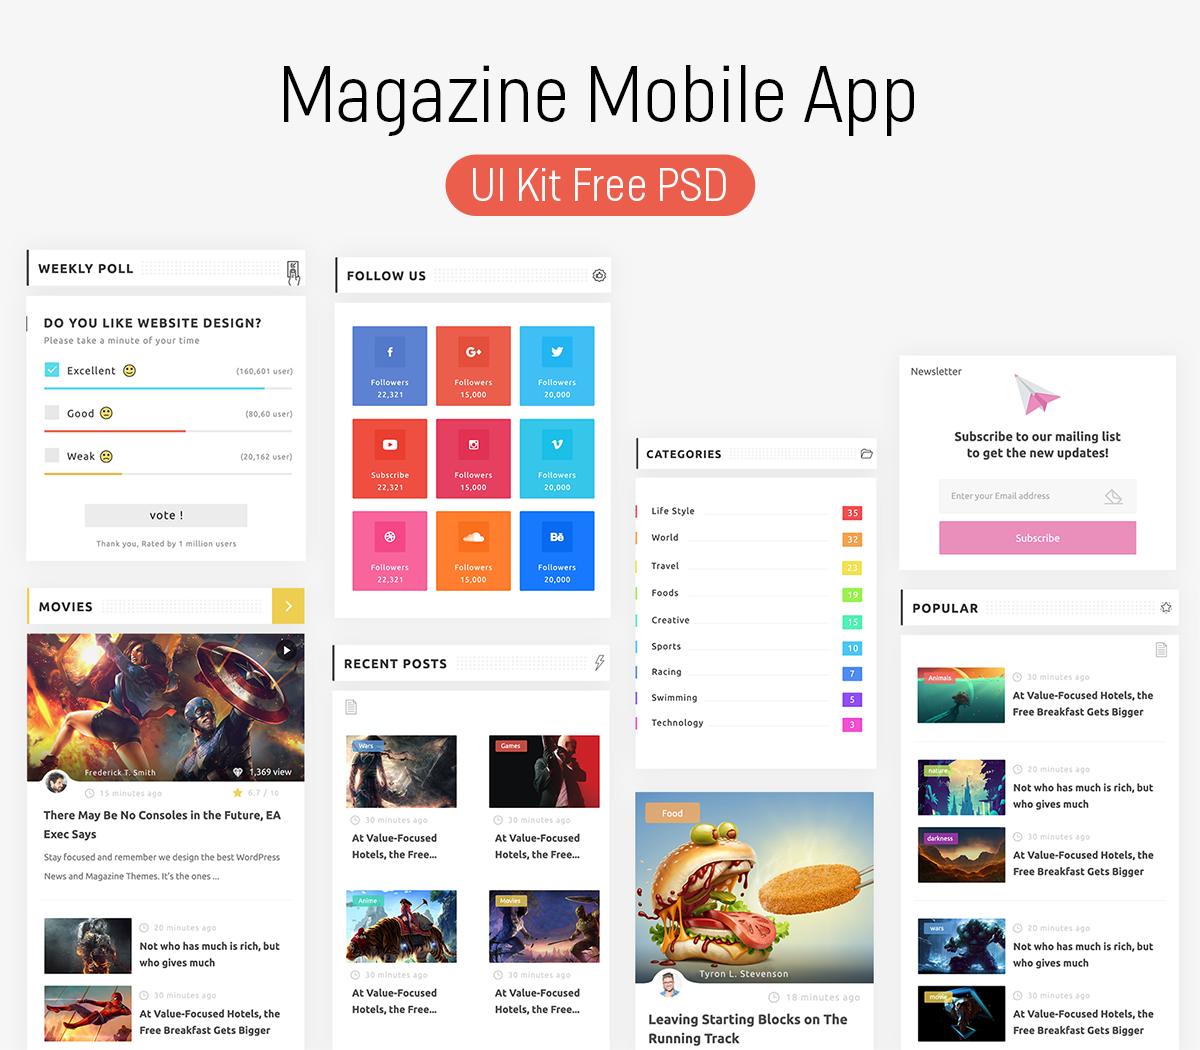 magazine mobile app ui kit psd download psd